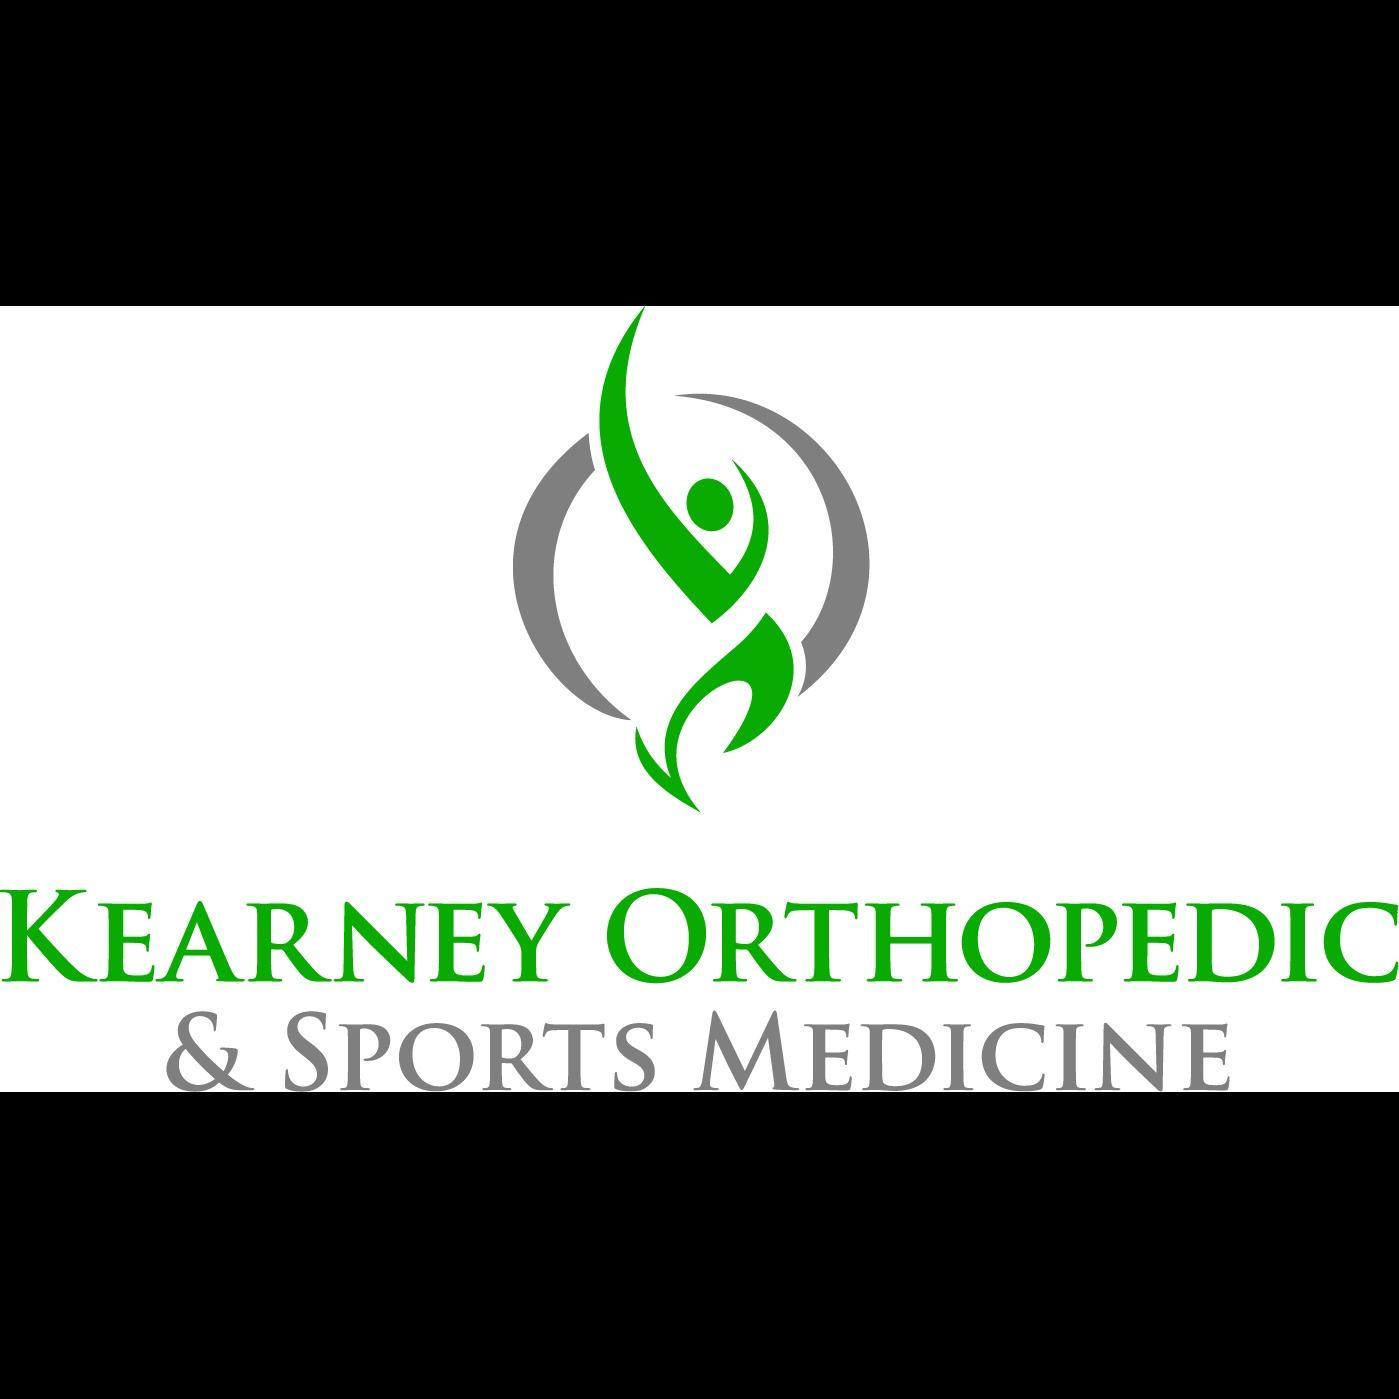 Kearney Orthopedic & Sports Medicine